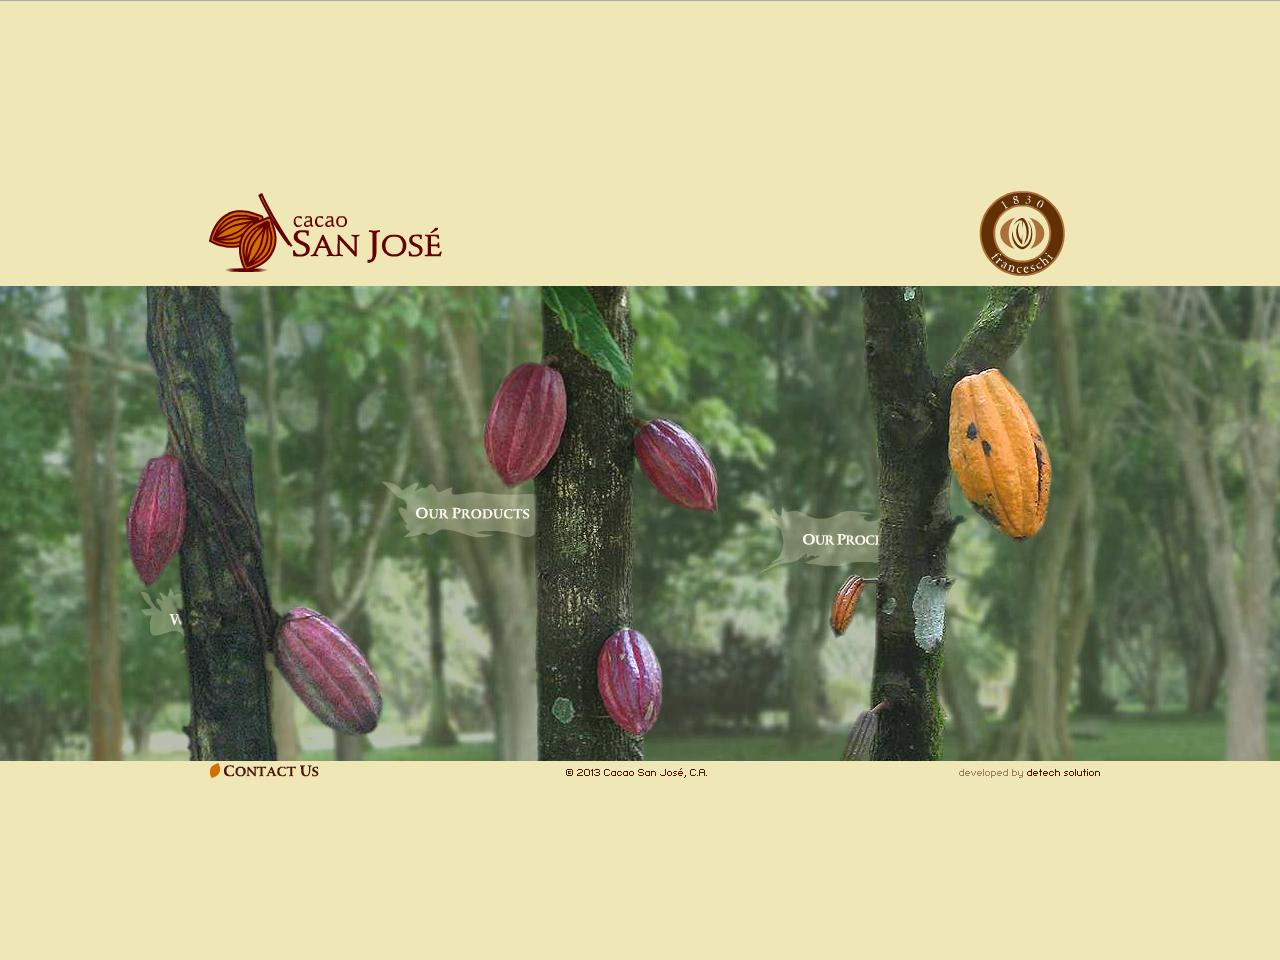 CACAO-SAN-JOSE